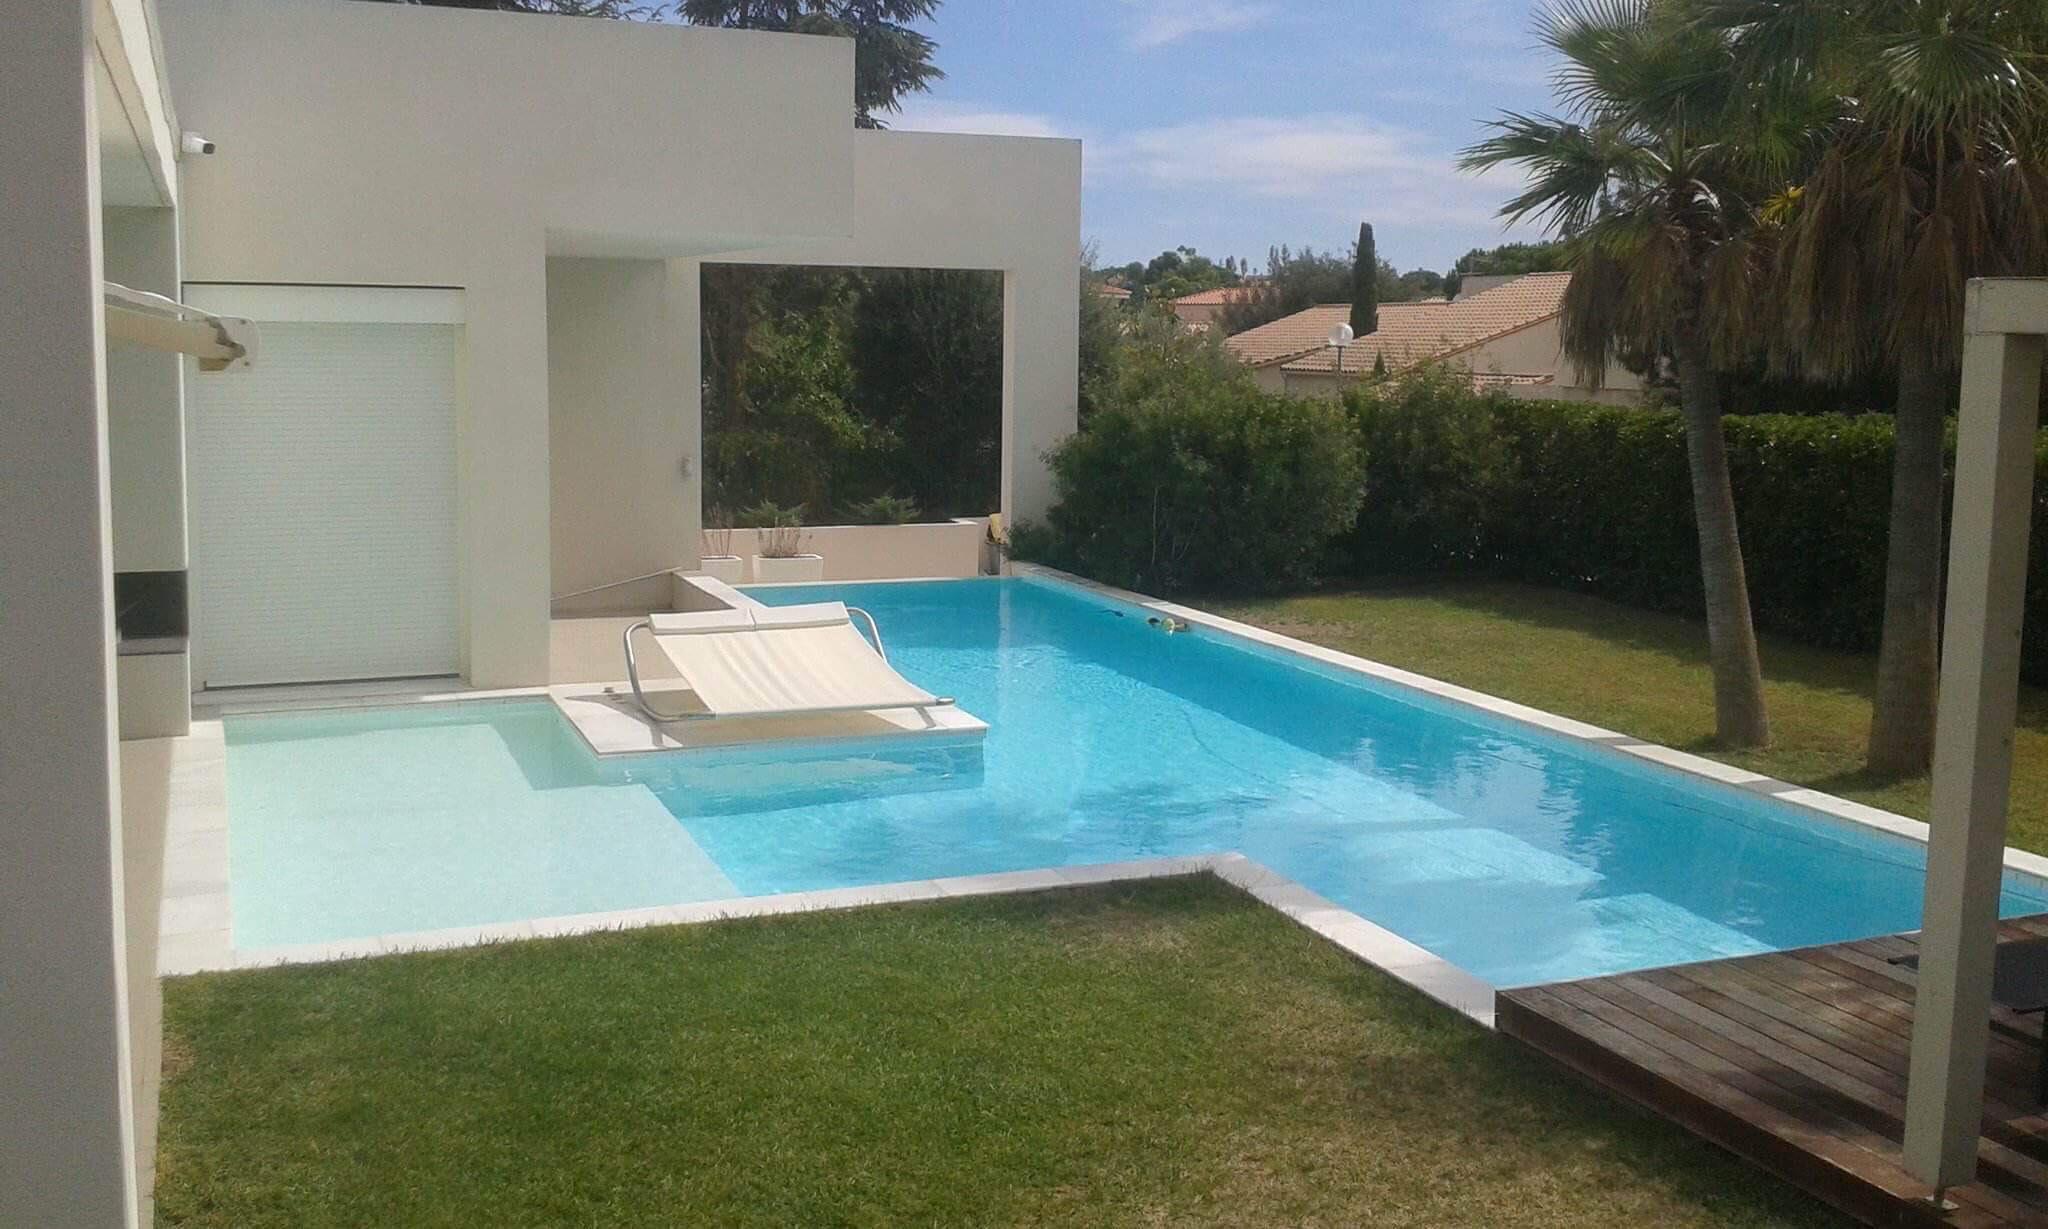 piscine oceazur Lyon